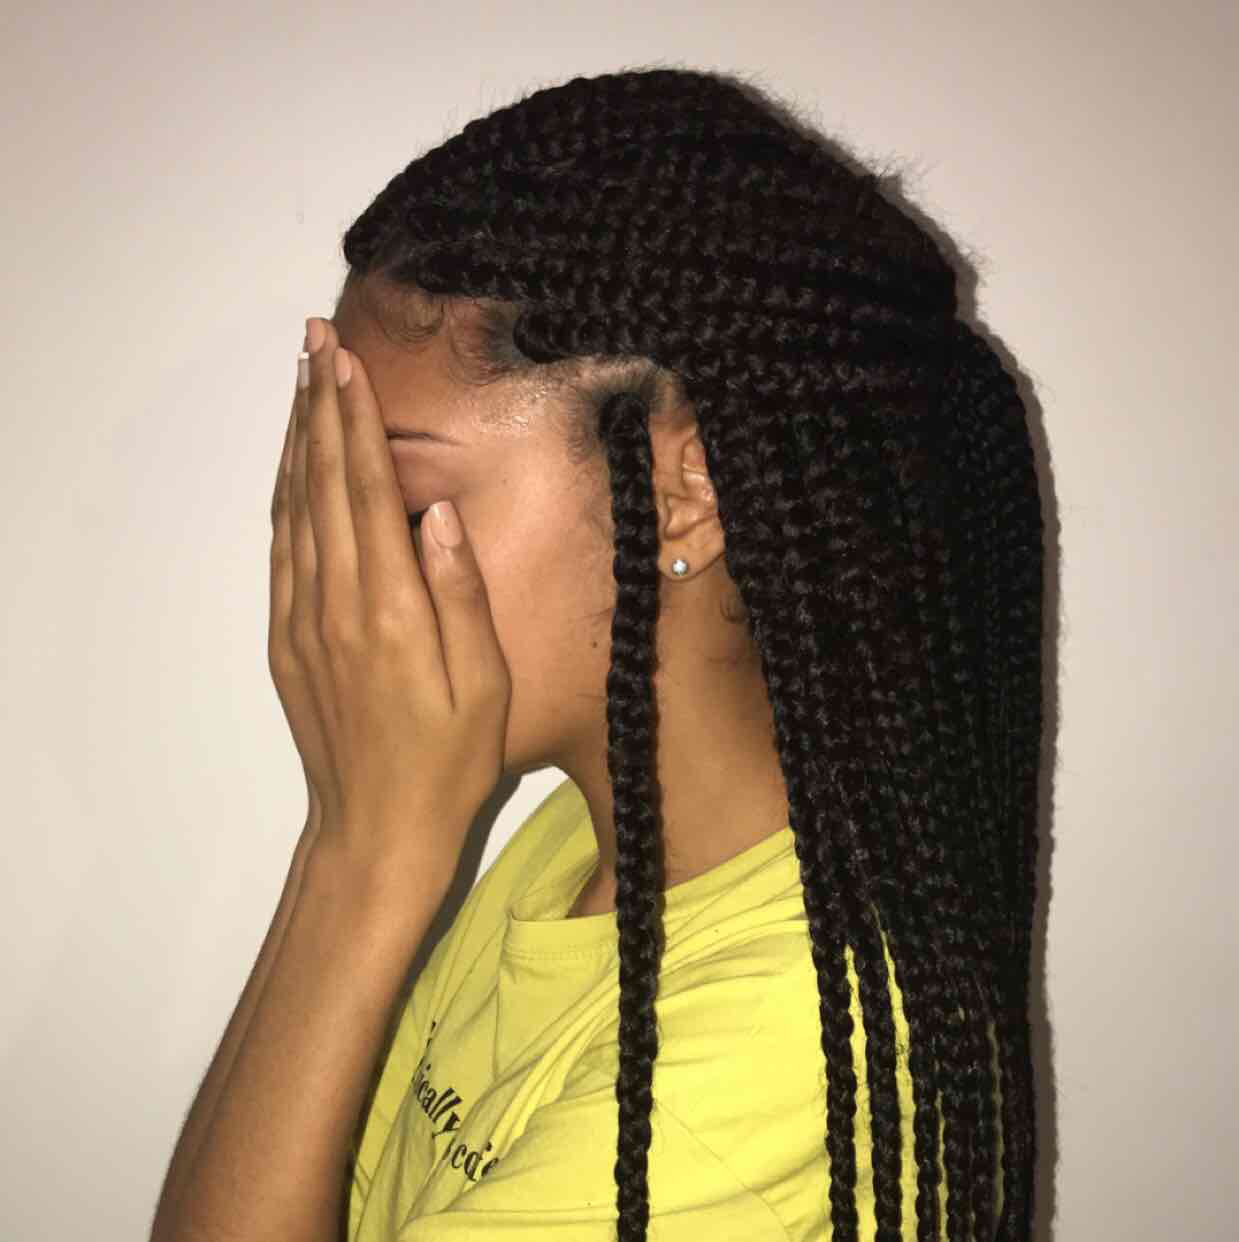 salon de coiffure afro tresse tresses box braids crochet braids vanilles tissages paris 75 77 78 91 92 93 94 95 IEKSATYS